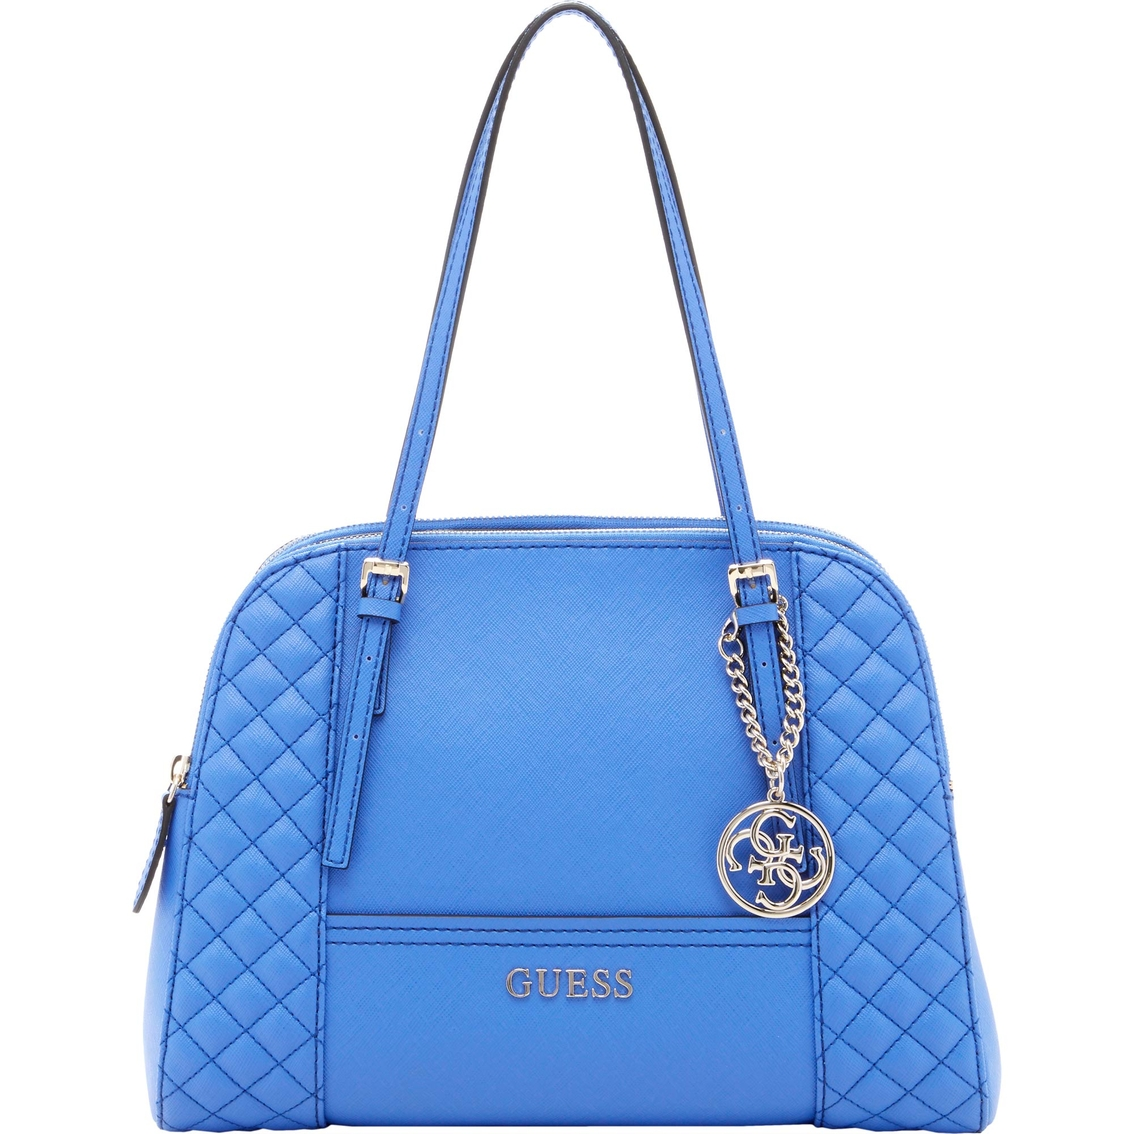 Kate Spade Wellesley Mini Rachelle Handbag Shoulder Bag Crossbody